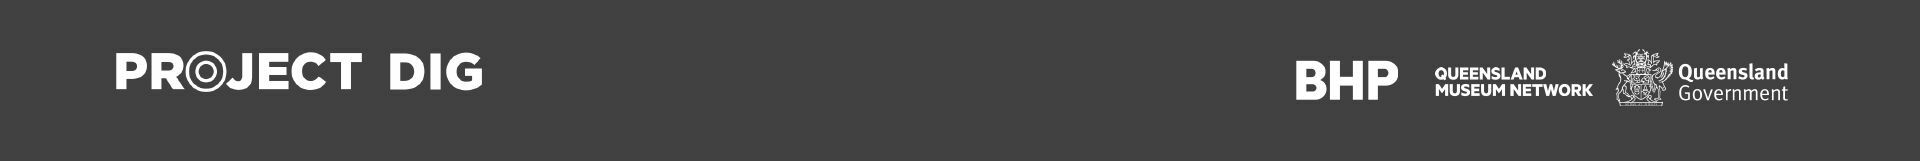 QM_background_branding